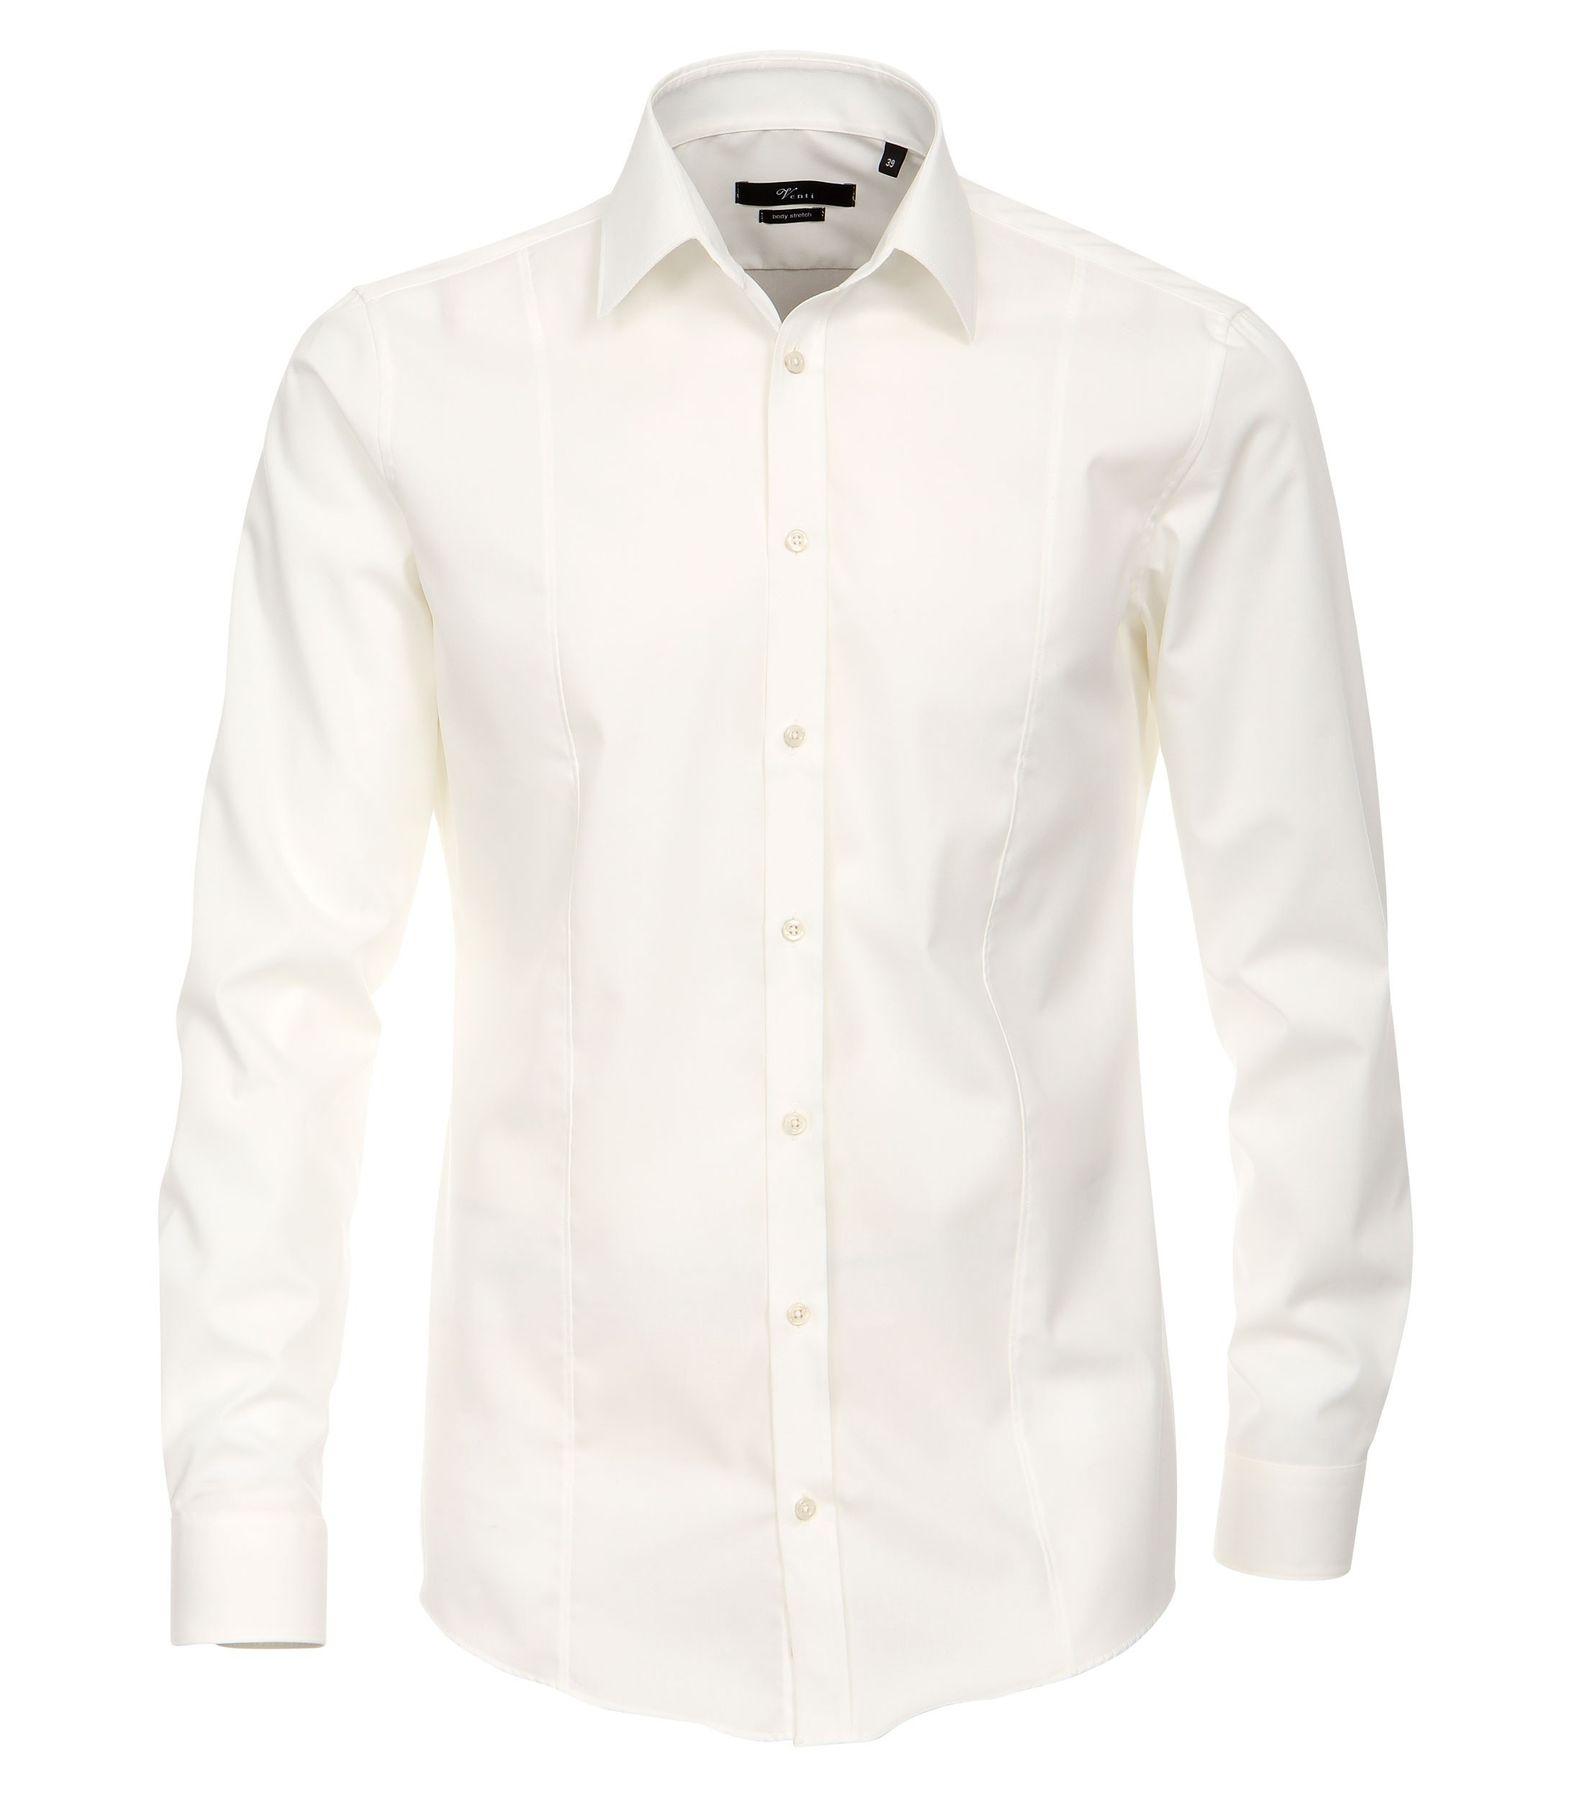 Venti - Body Fit/Super Slim Fit - Bügelfreies Herren Langarm Hemd in diversen Farben (001470) – Bild 6